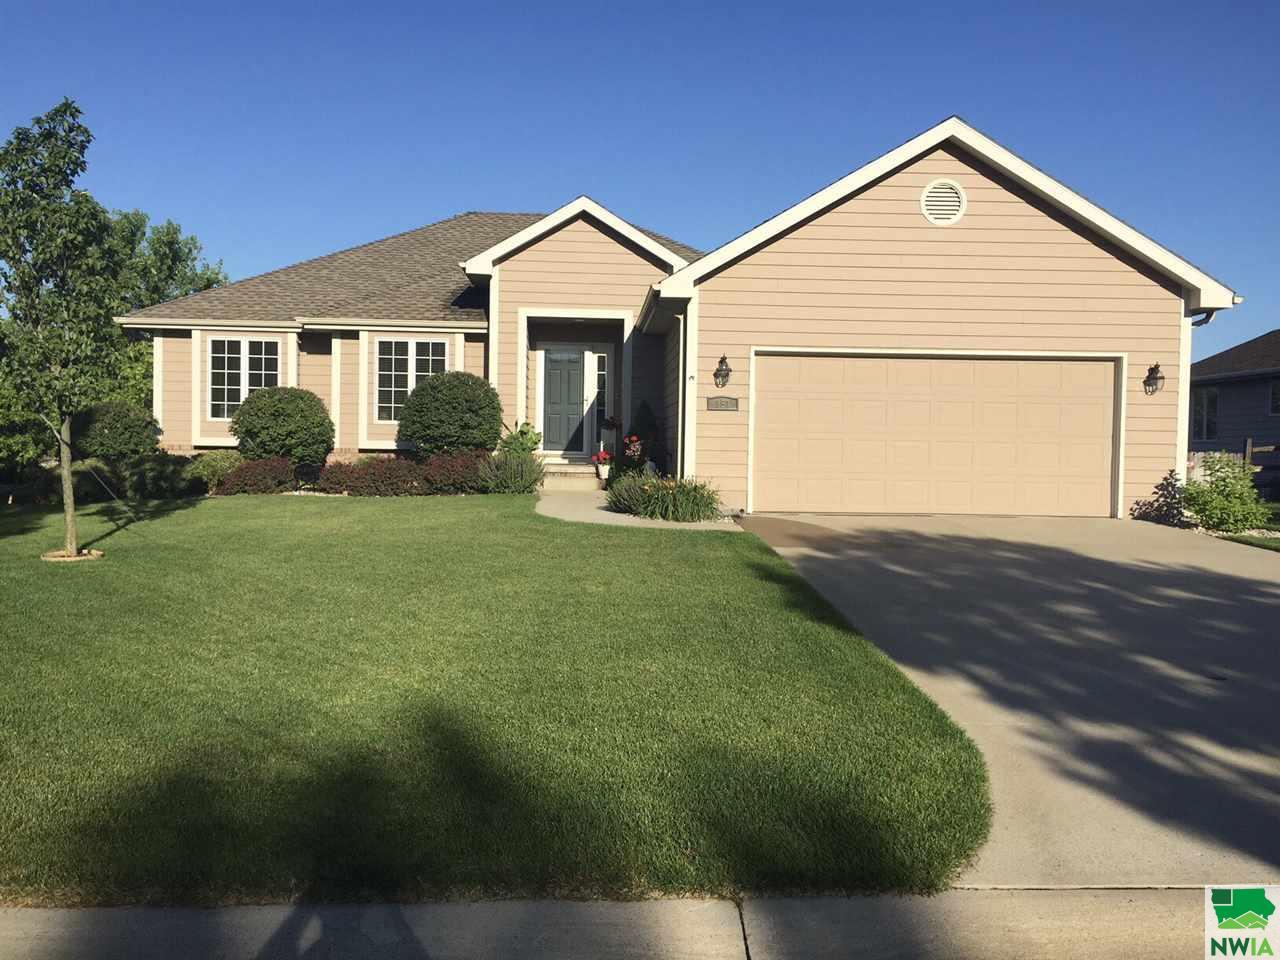 Property for sale at 351 Partridge, Dakota Dunes,  SD 57049